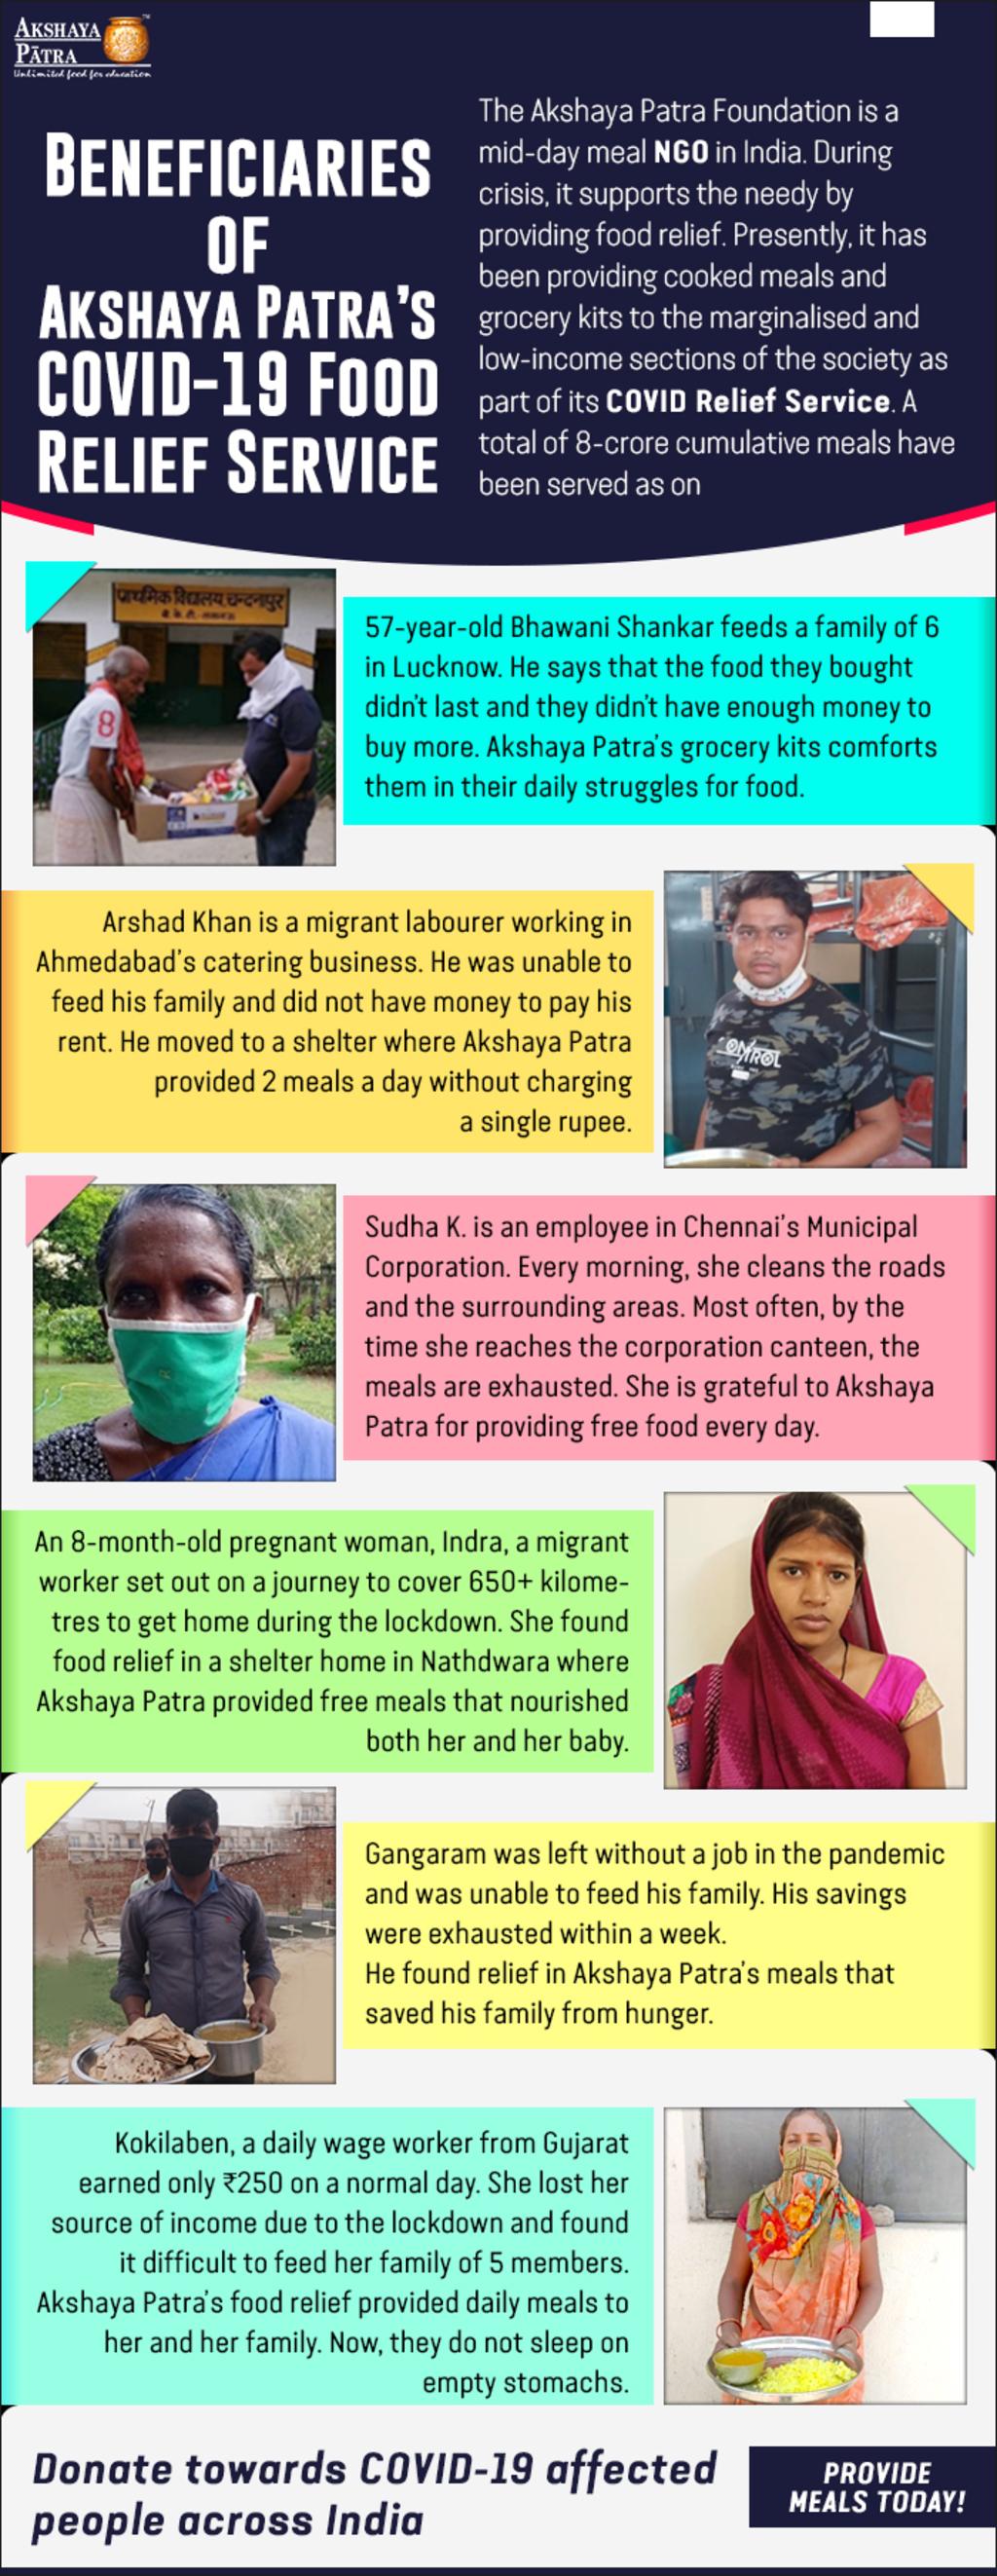 COVID-19 Food Relief Service in India via Akshaya Patra